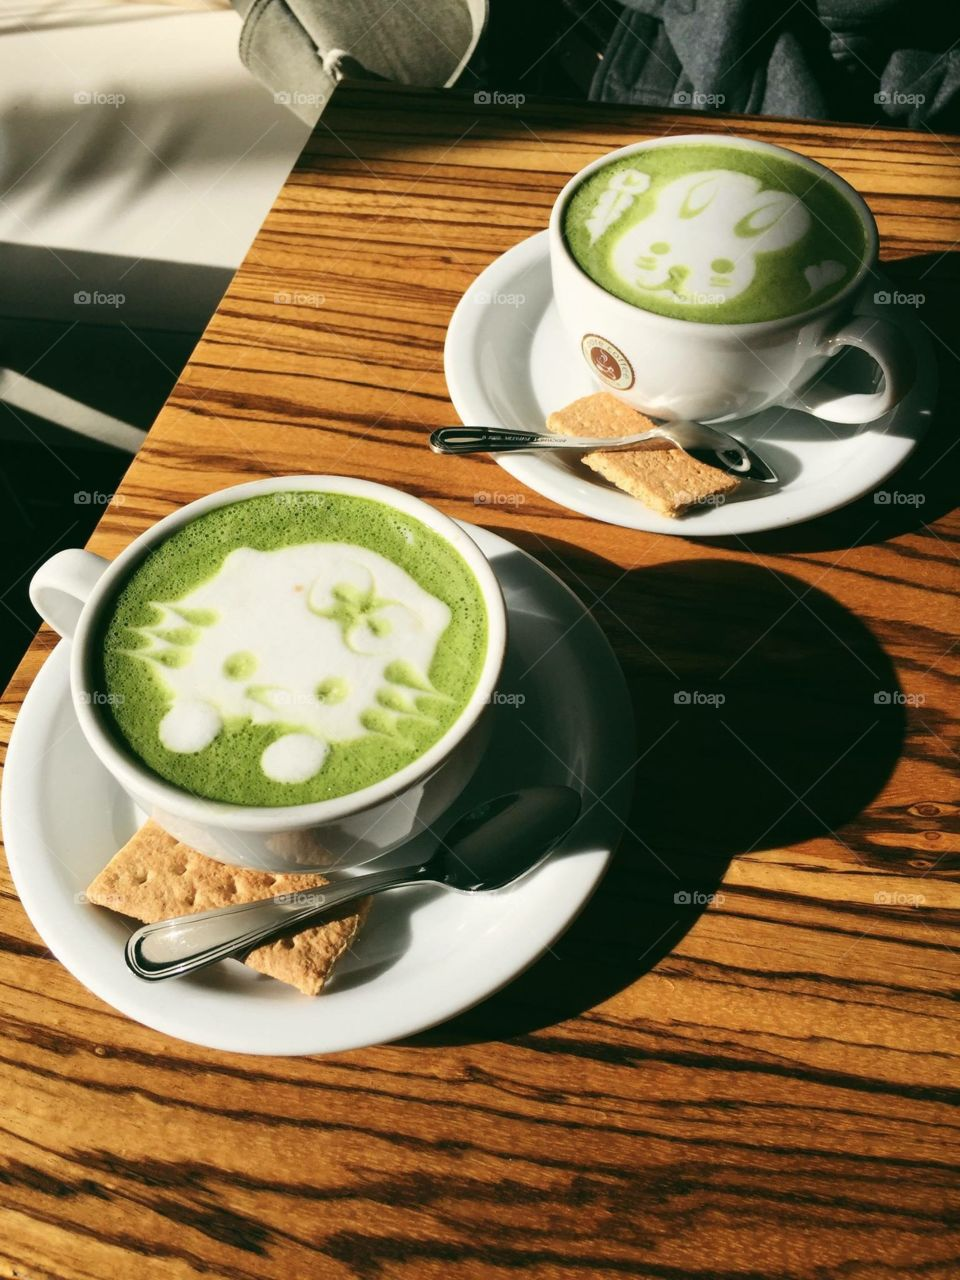 Hello kitty matcha latte